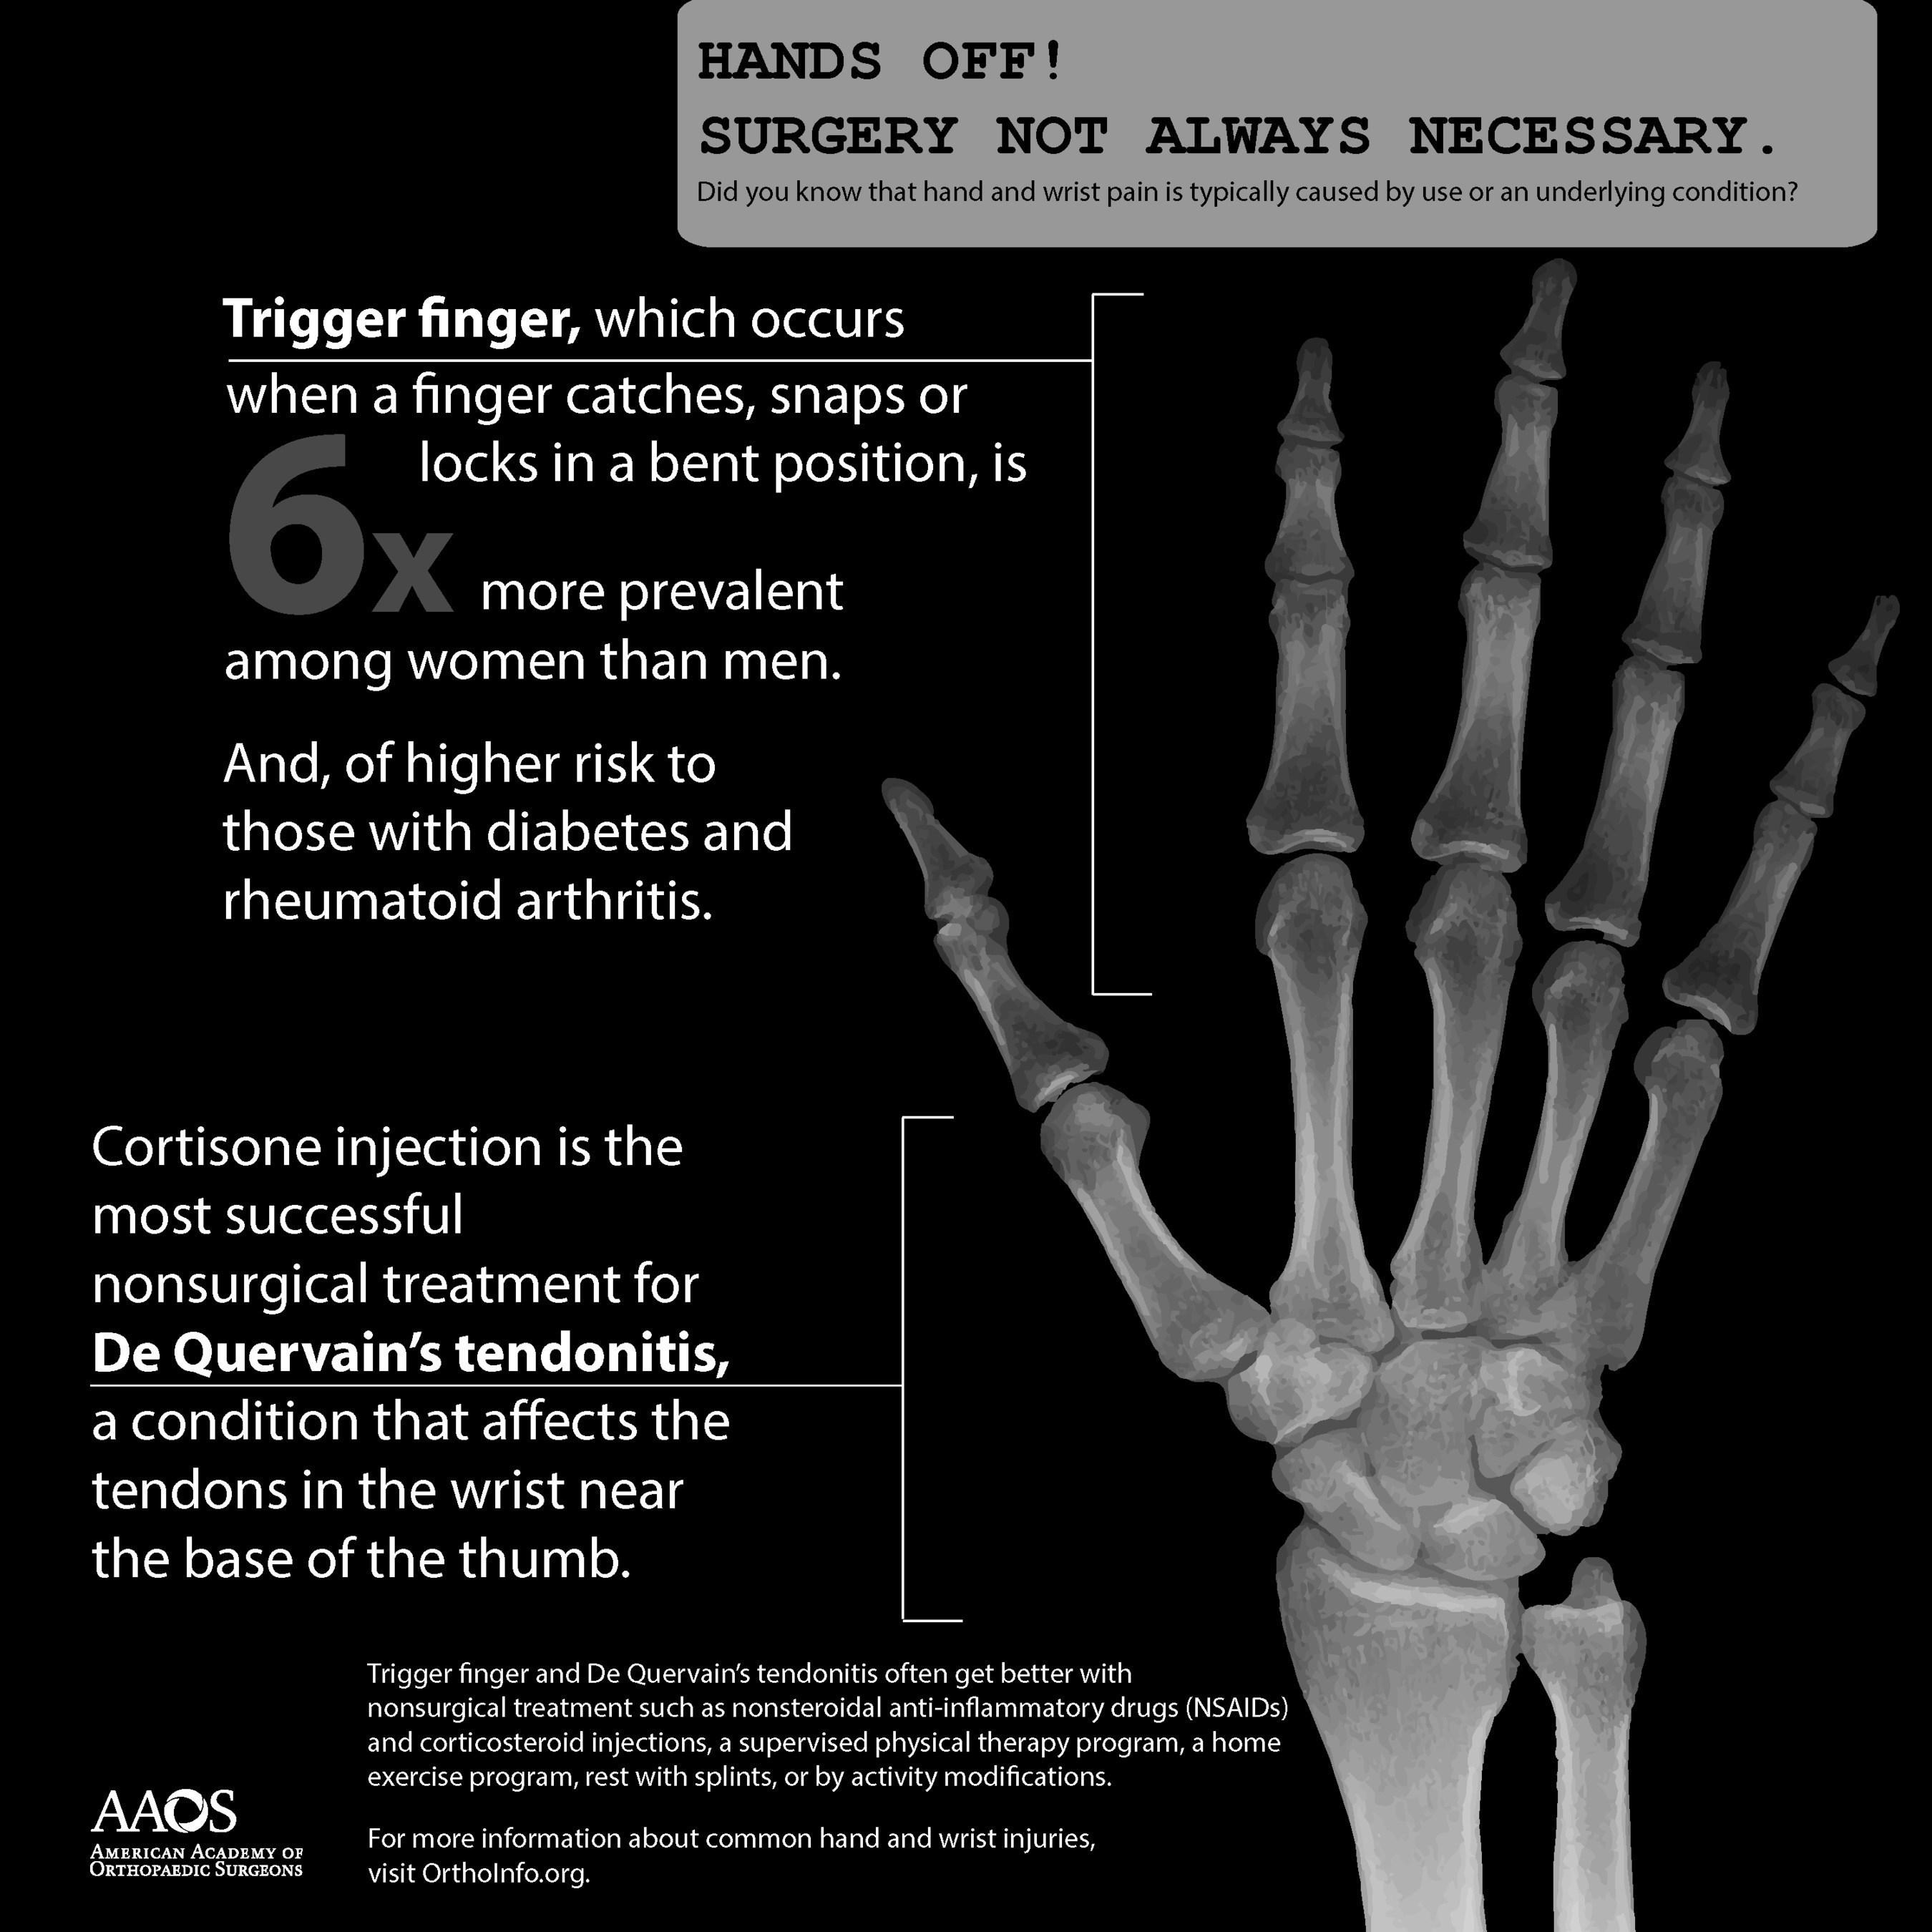 Hands off! Surgery not always necessary.